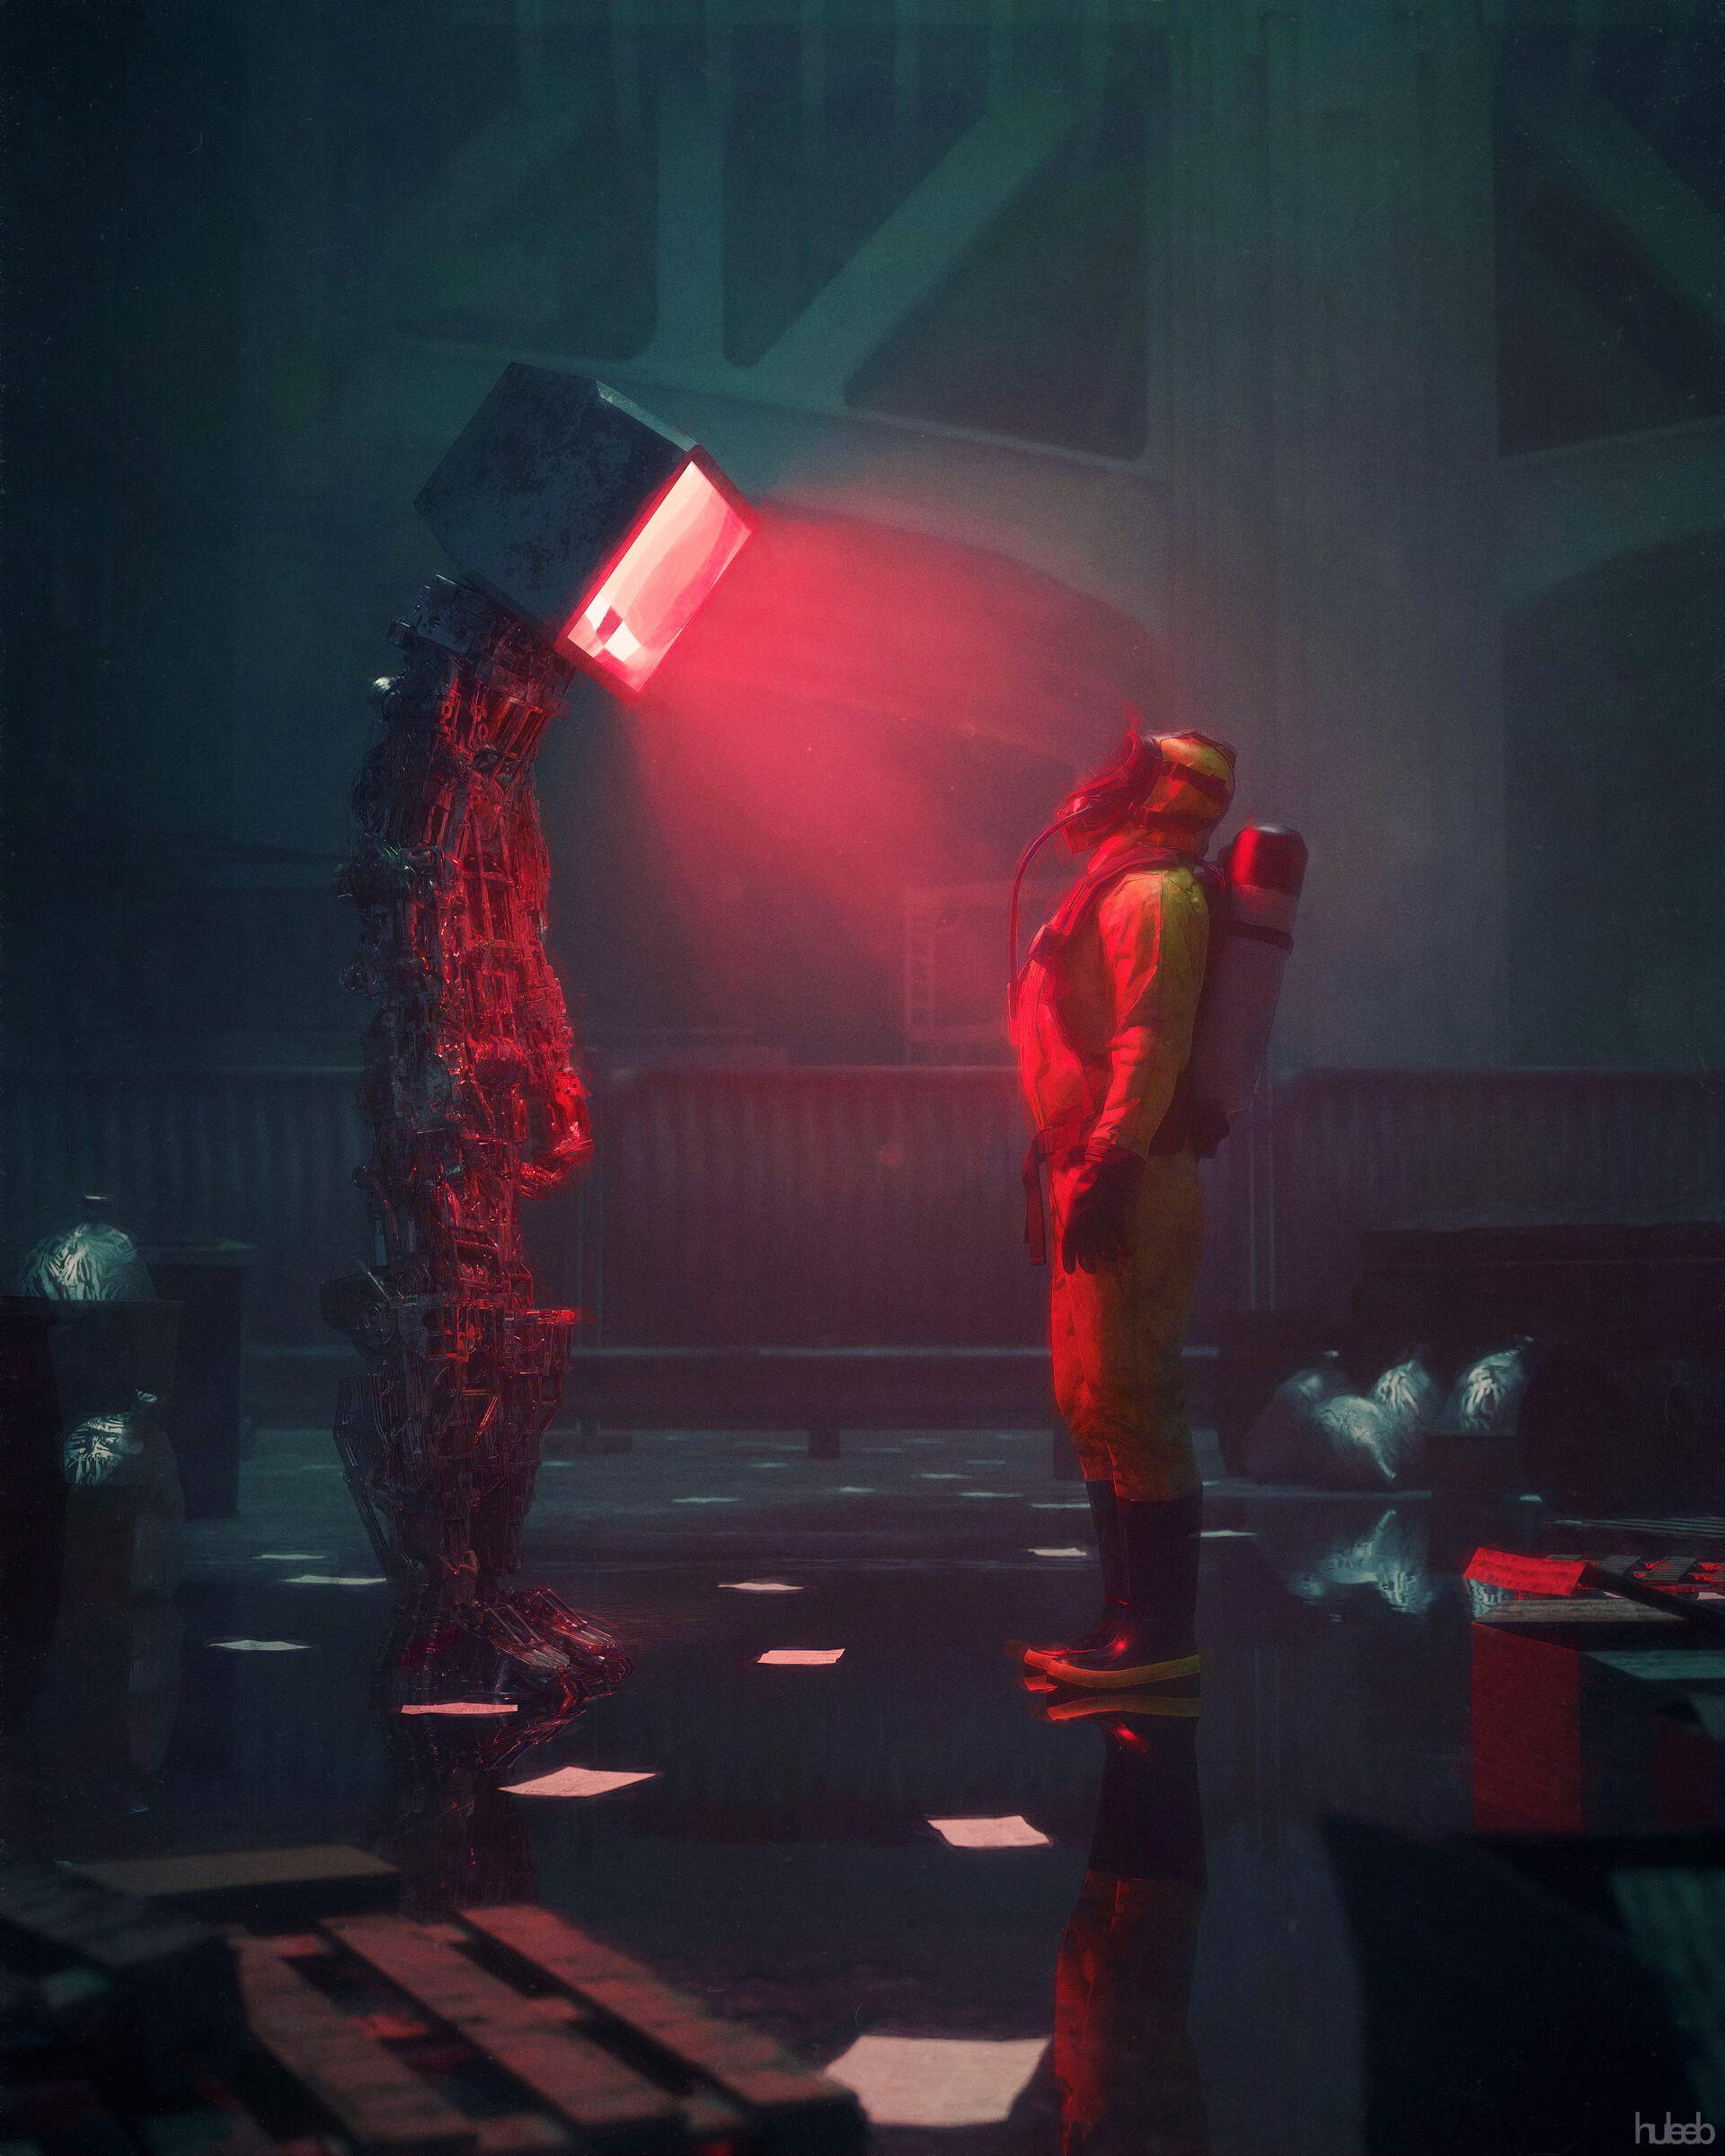 The Surreal Digital Sci-Fi Creations of Huleeb